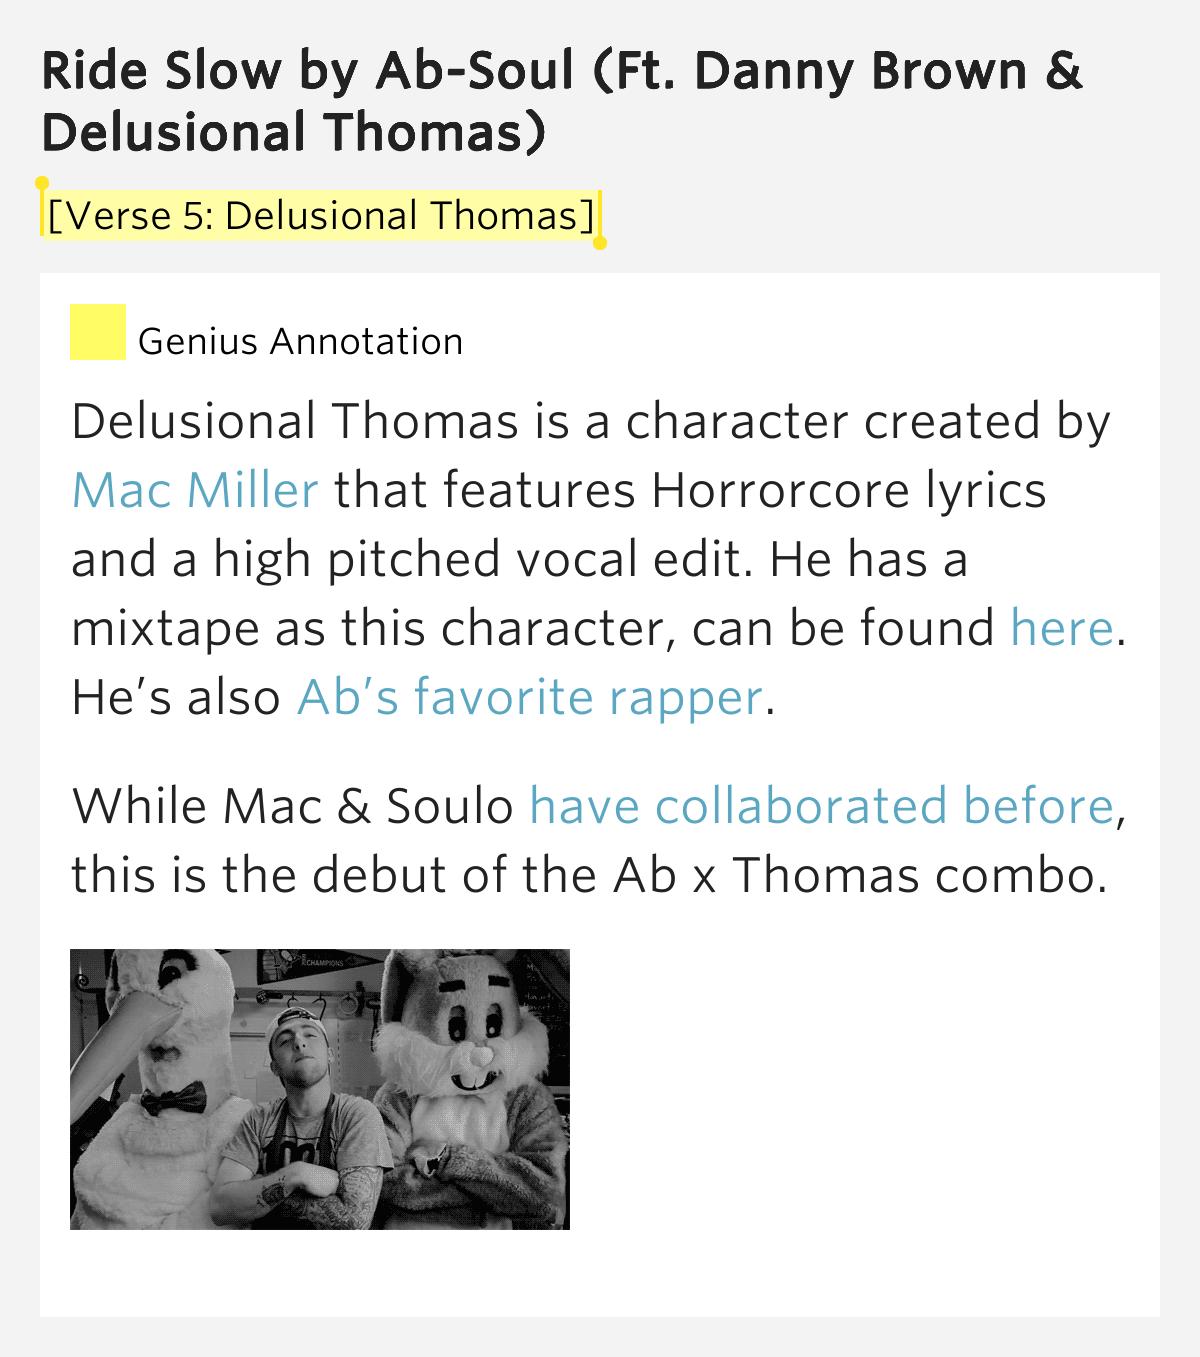 mac miller delusional thomas lyrics - photo #2